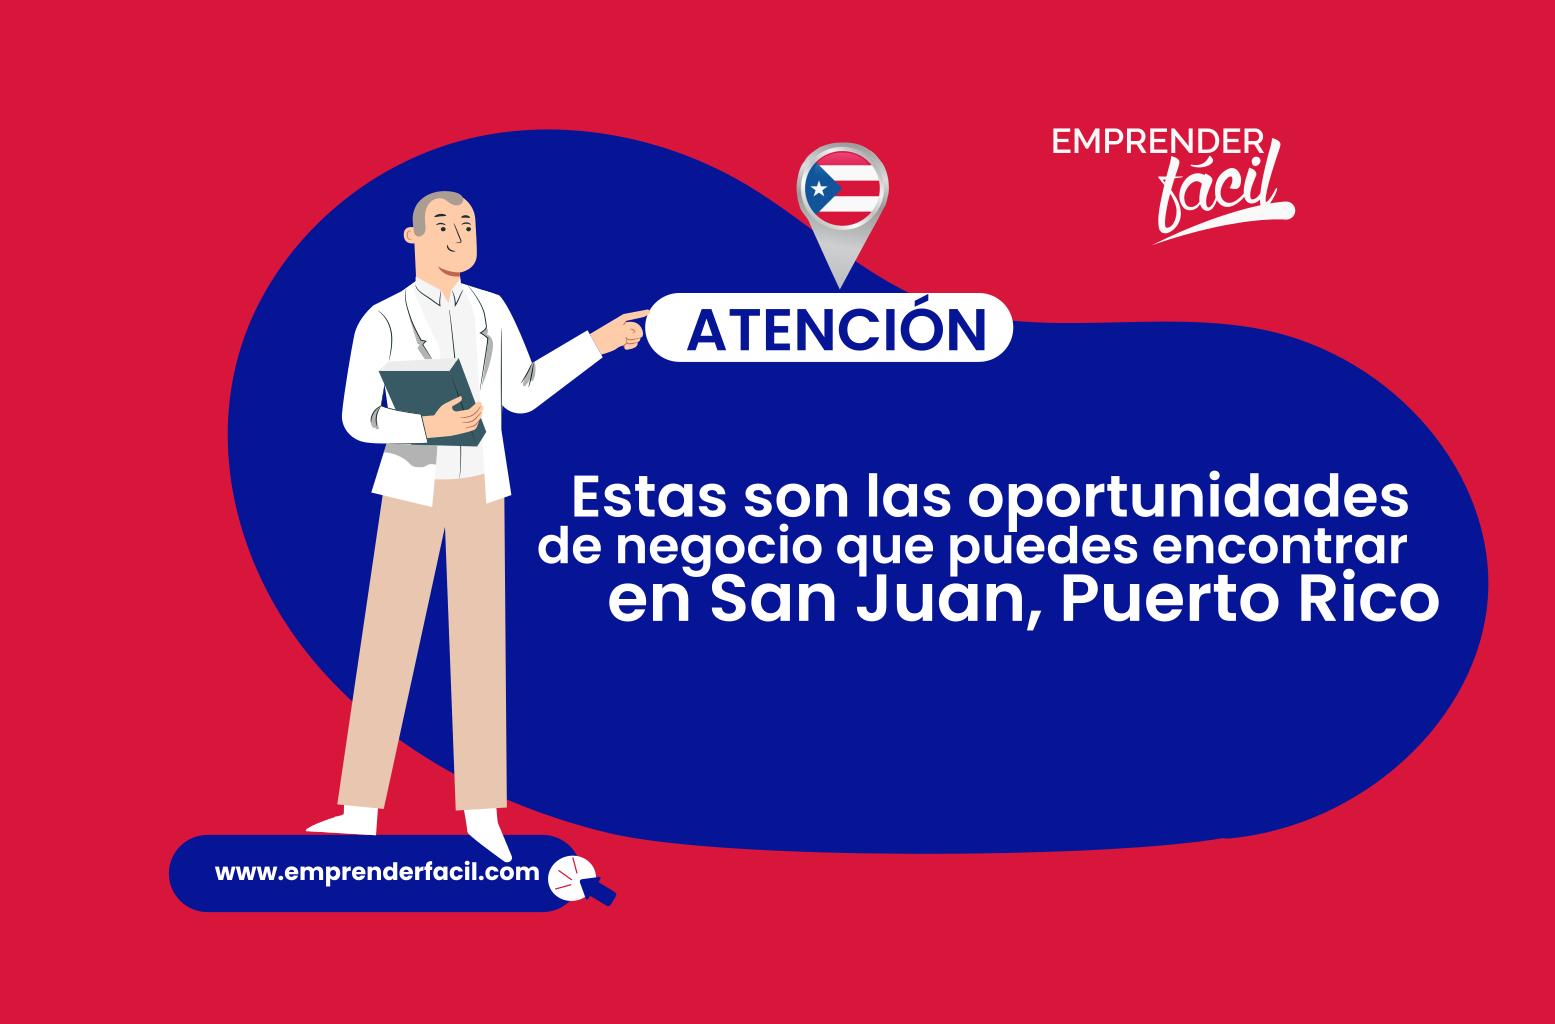 Posibilidades de emprender en San Juan, Puerto Rico